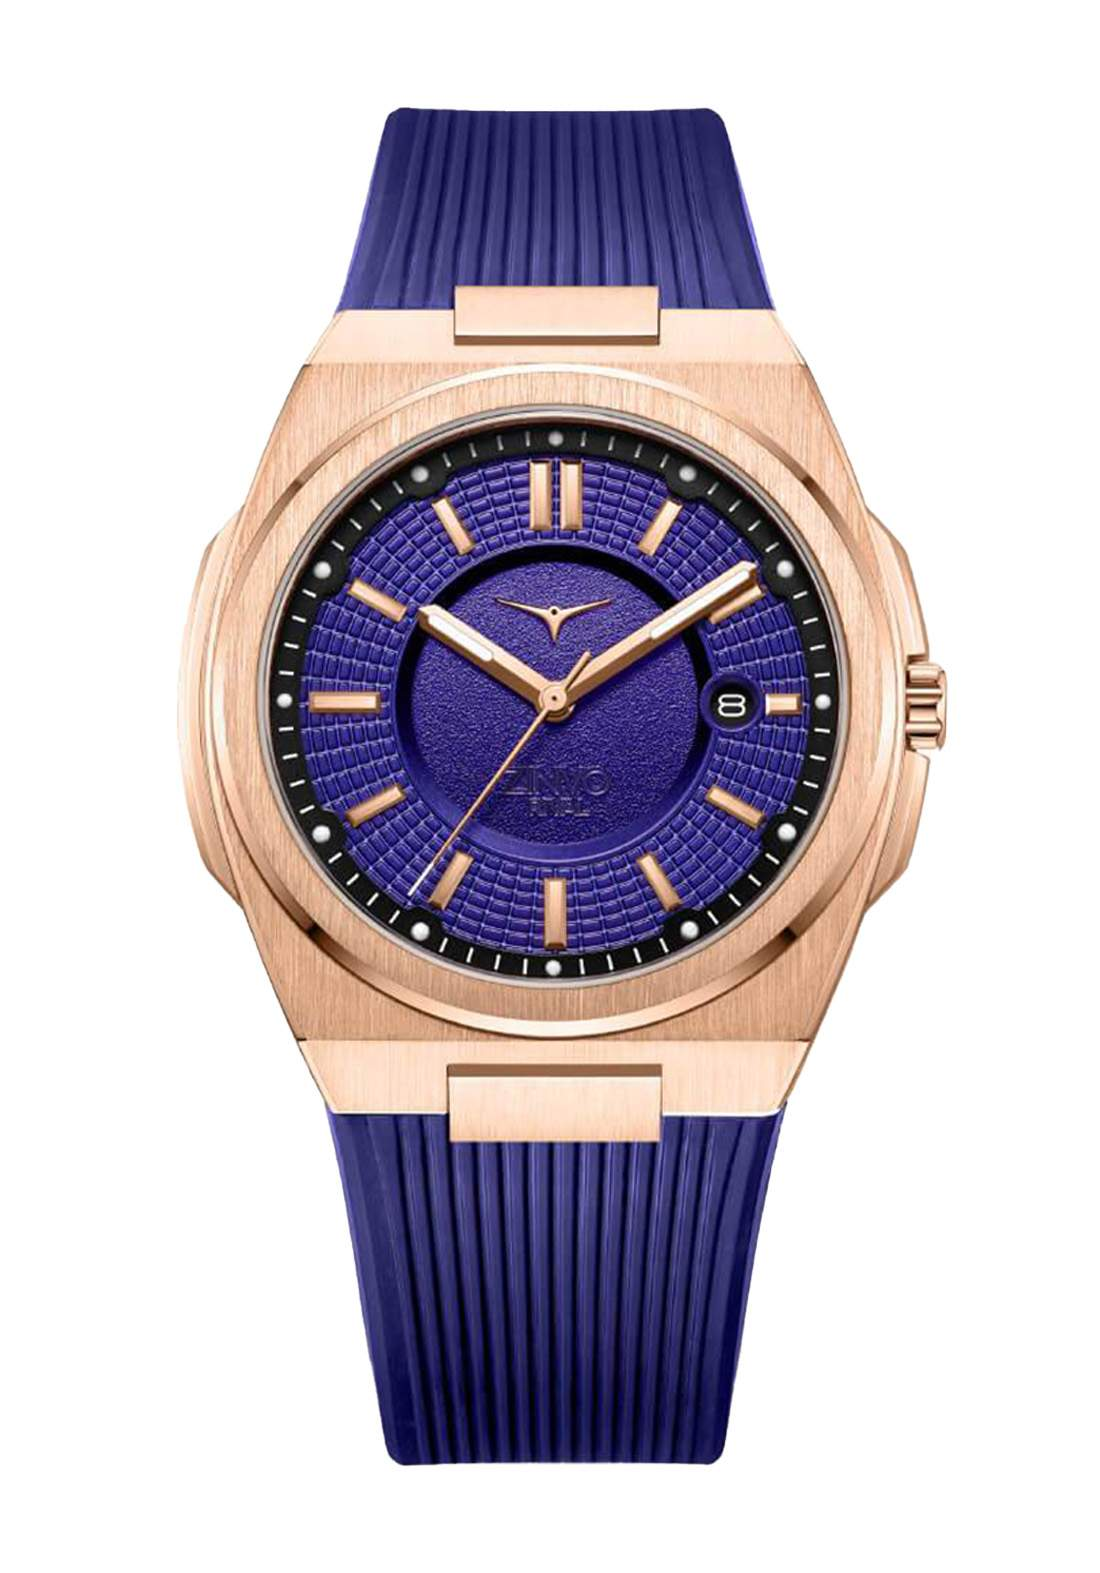 Zinvo Rival Galaxy Watch For Men  ساعة رجالي